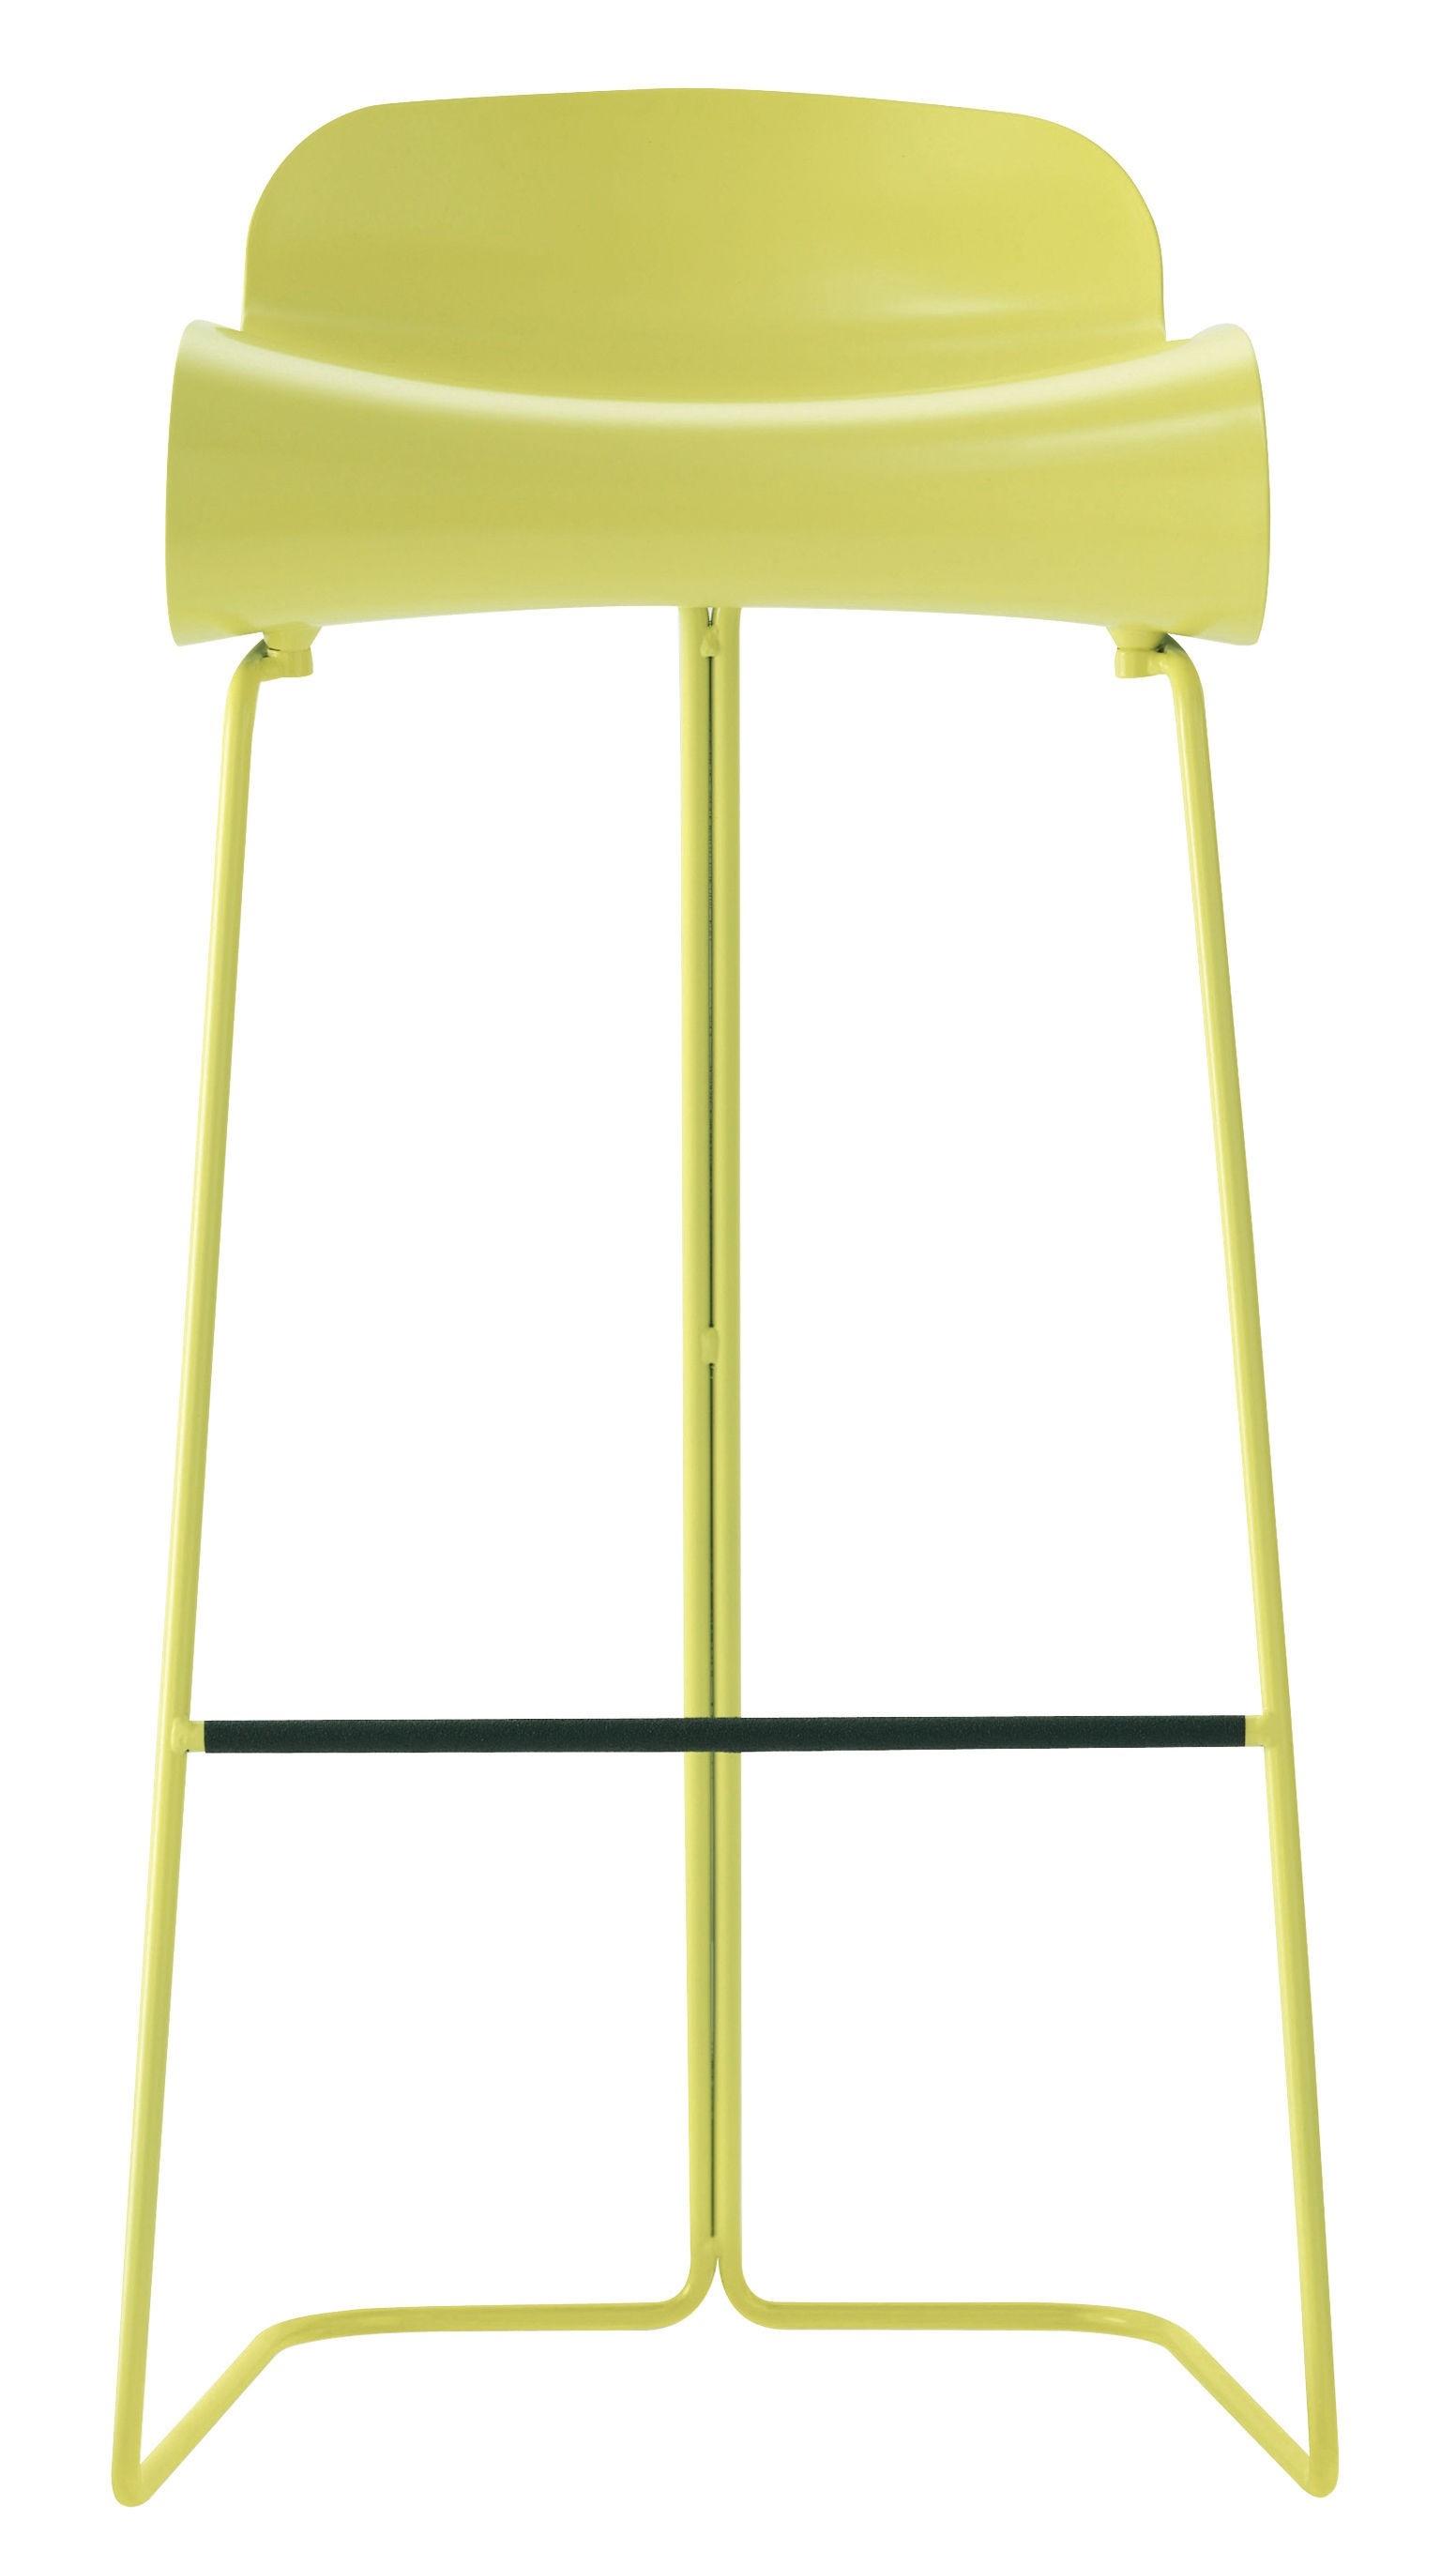 Sgabello kristalia modello bcn sedie a prezzi scontati for Sedie kristalia outlet